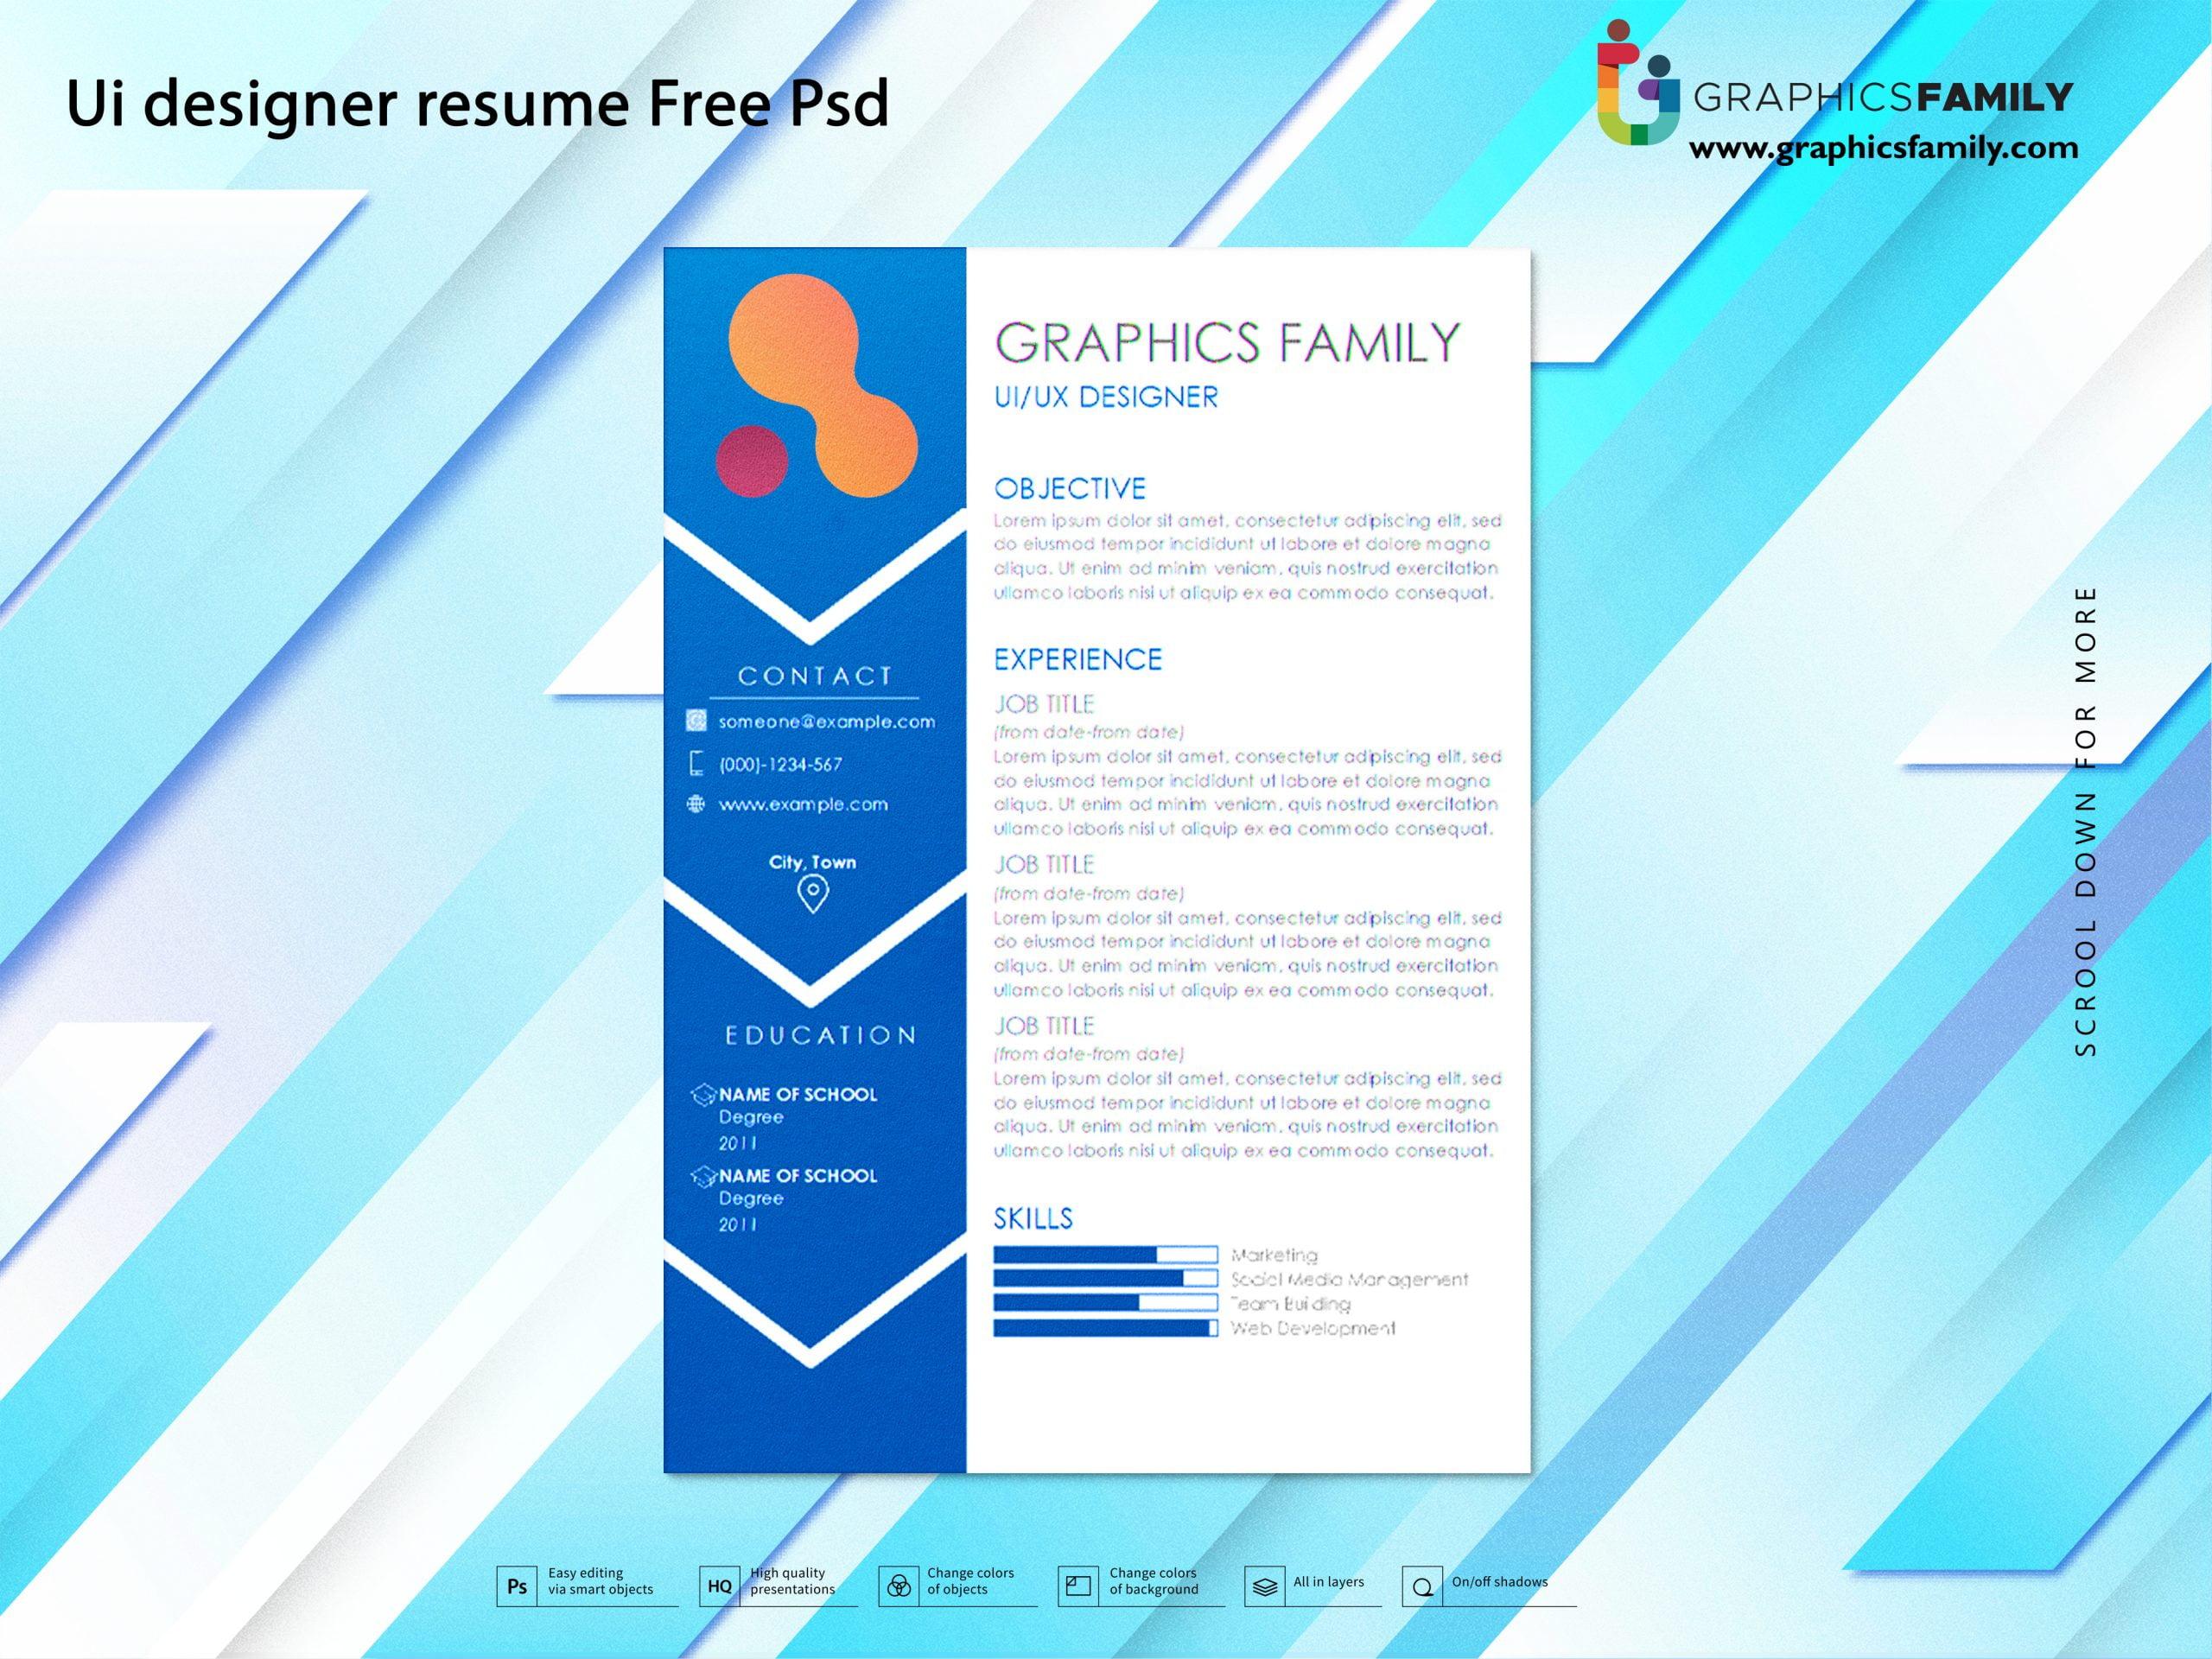 Ui designer resume Free Psd Download